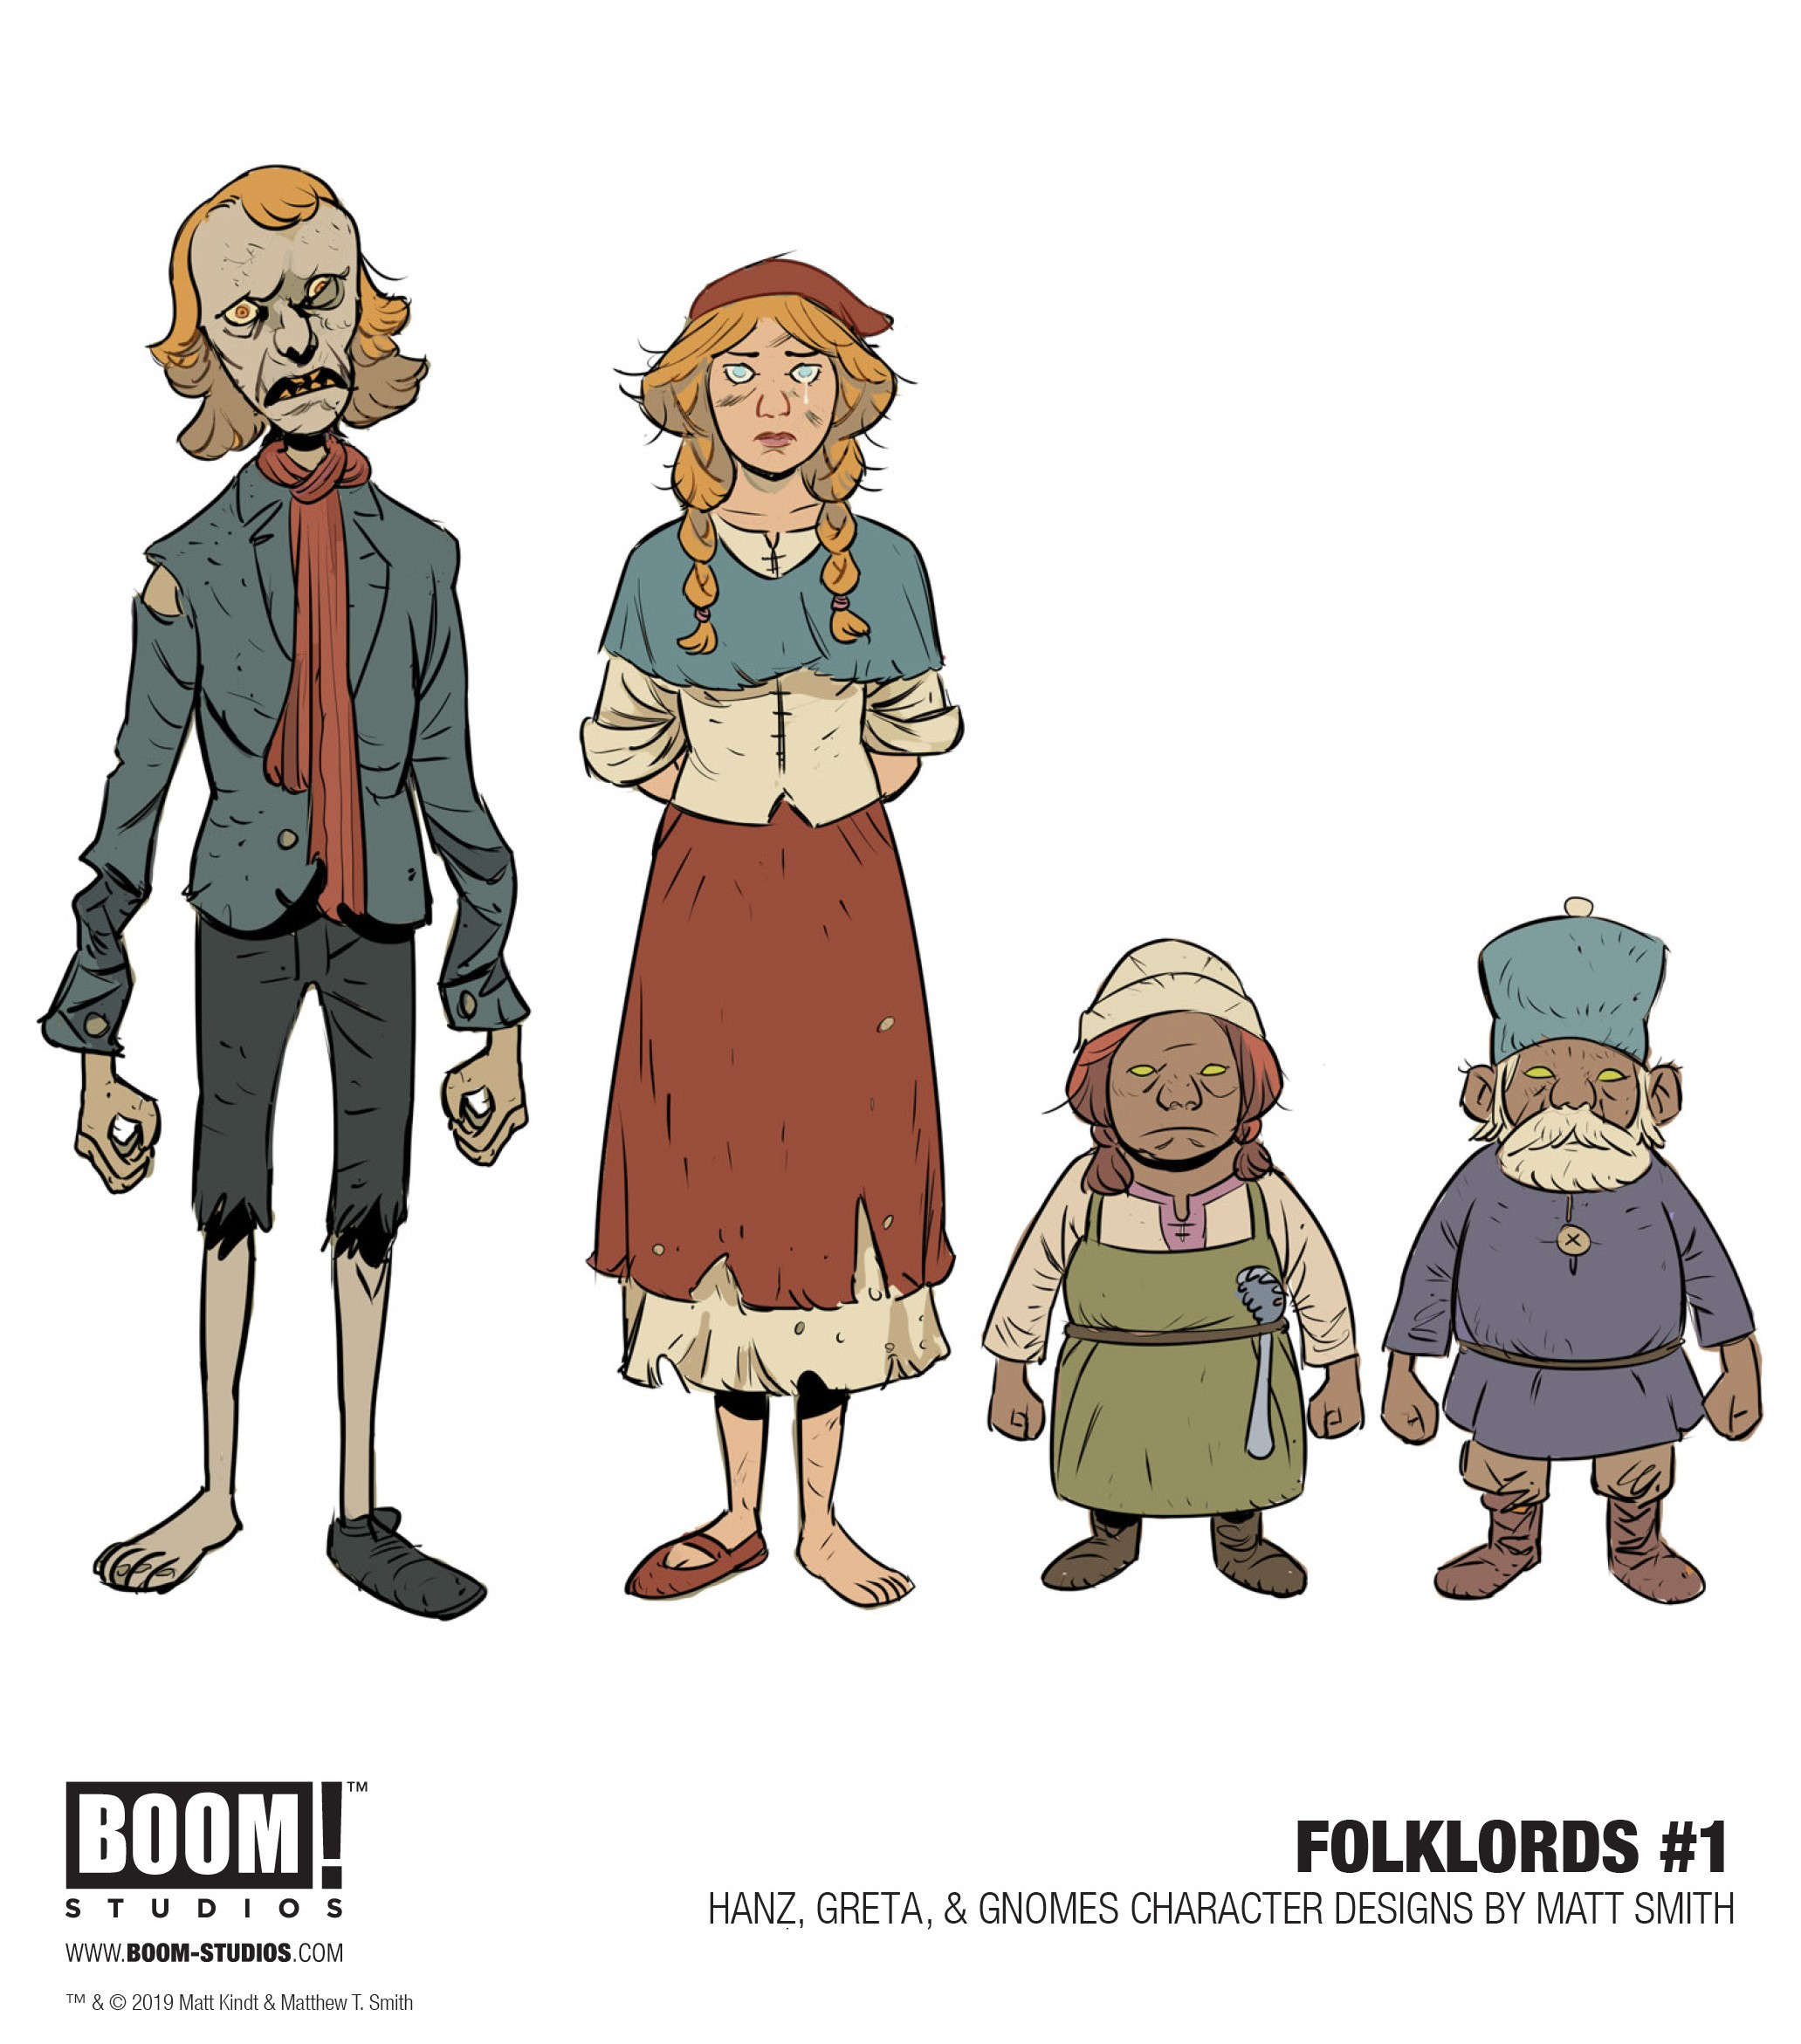 Folklords_001_Character_HansGretaGnomes_Promo.jpg